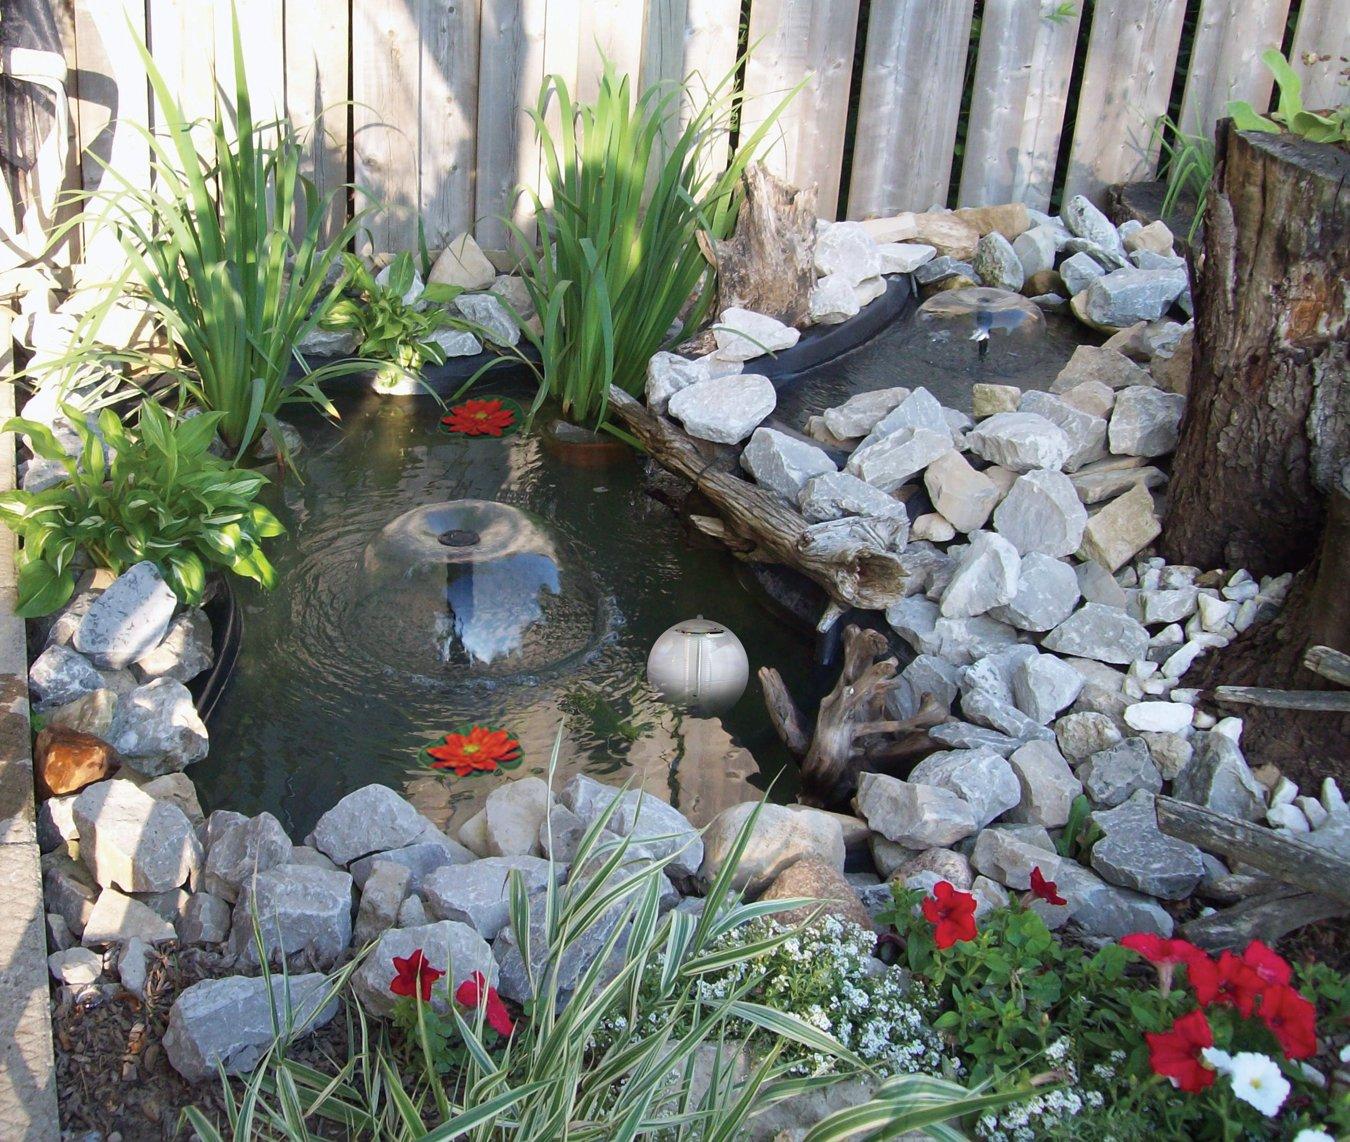 Koolscapes 270 Gallon Pond Kit with Lighting by Koolatron